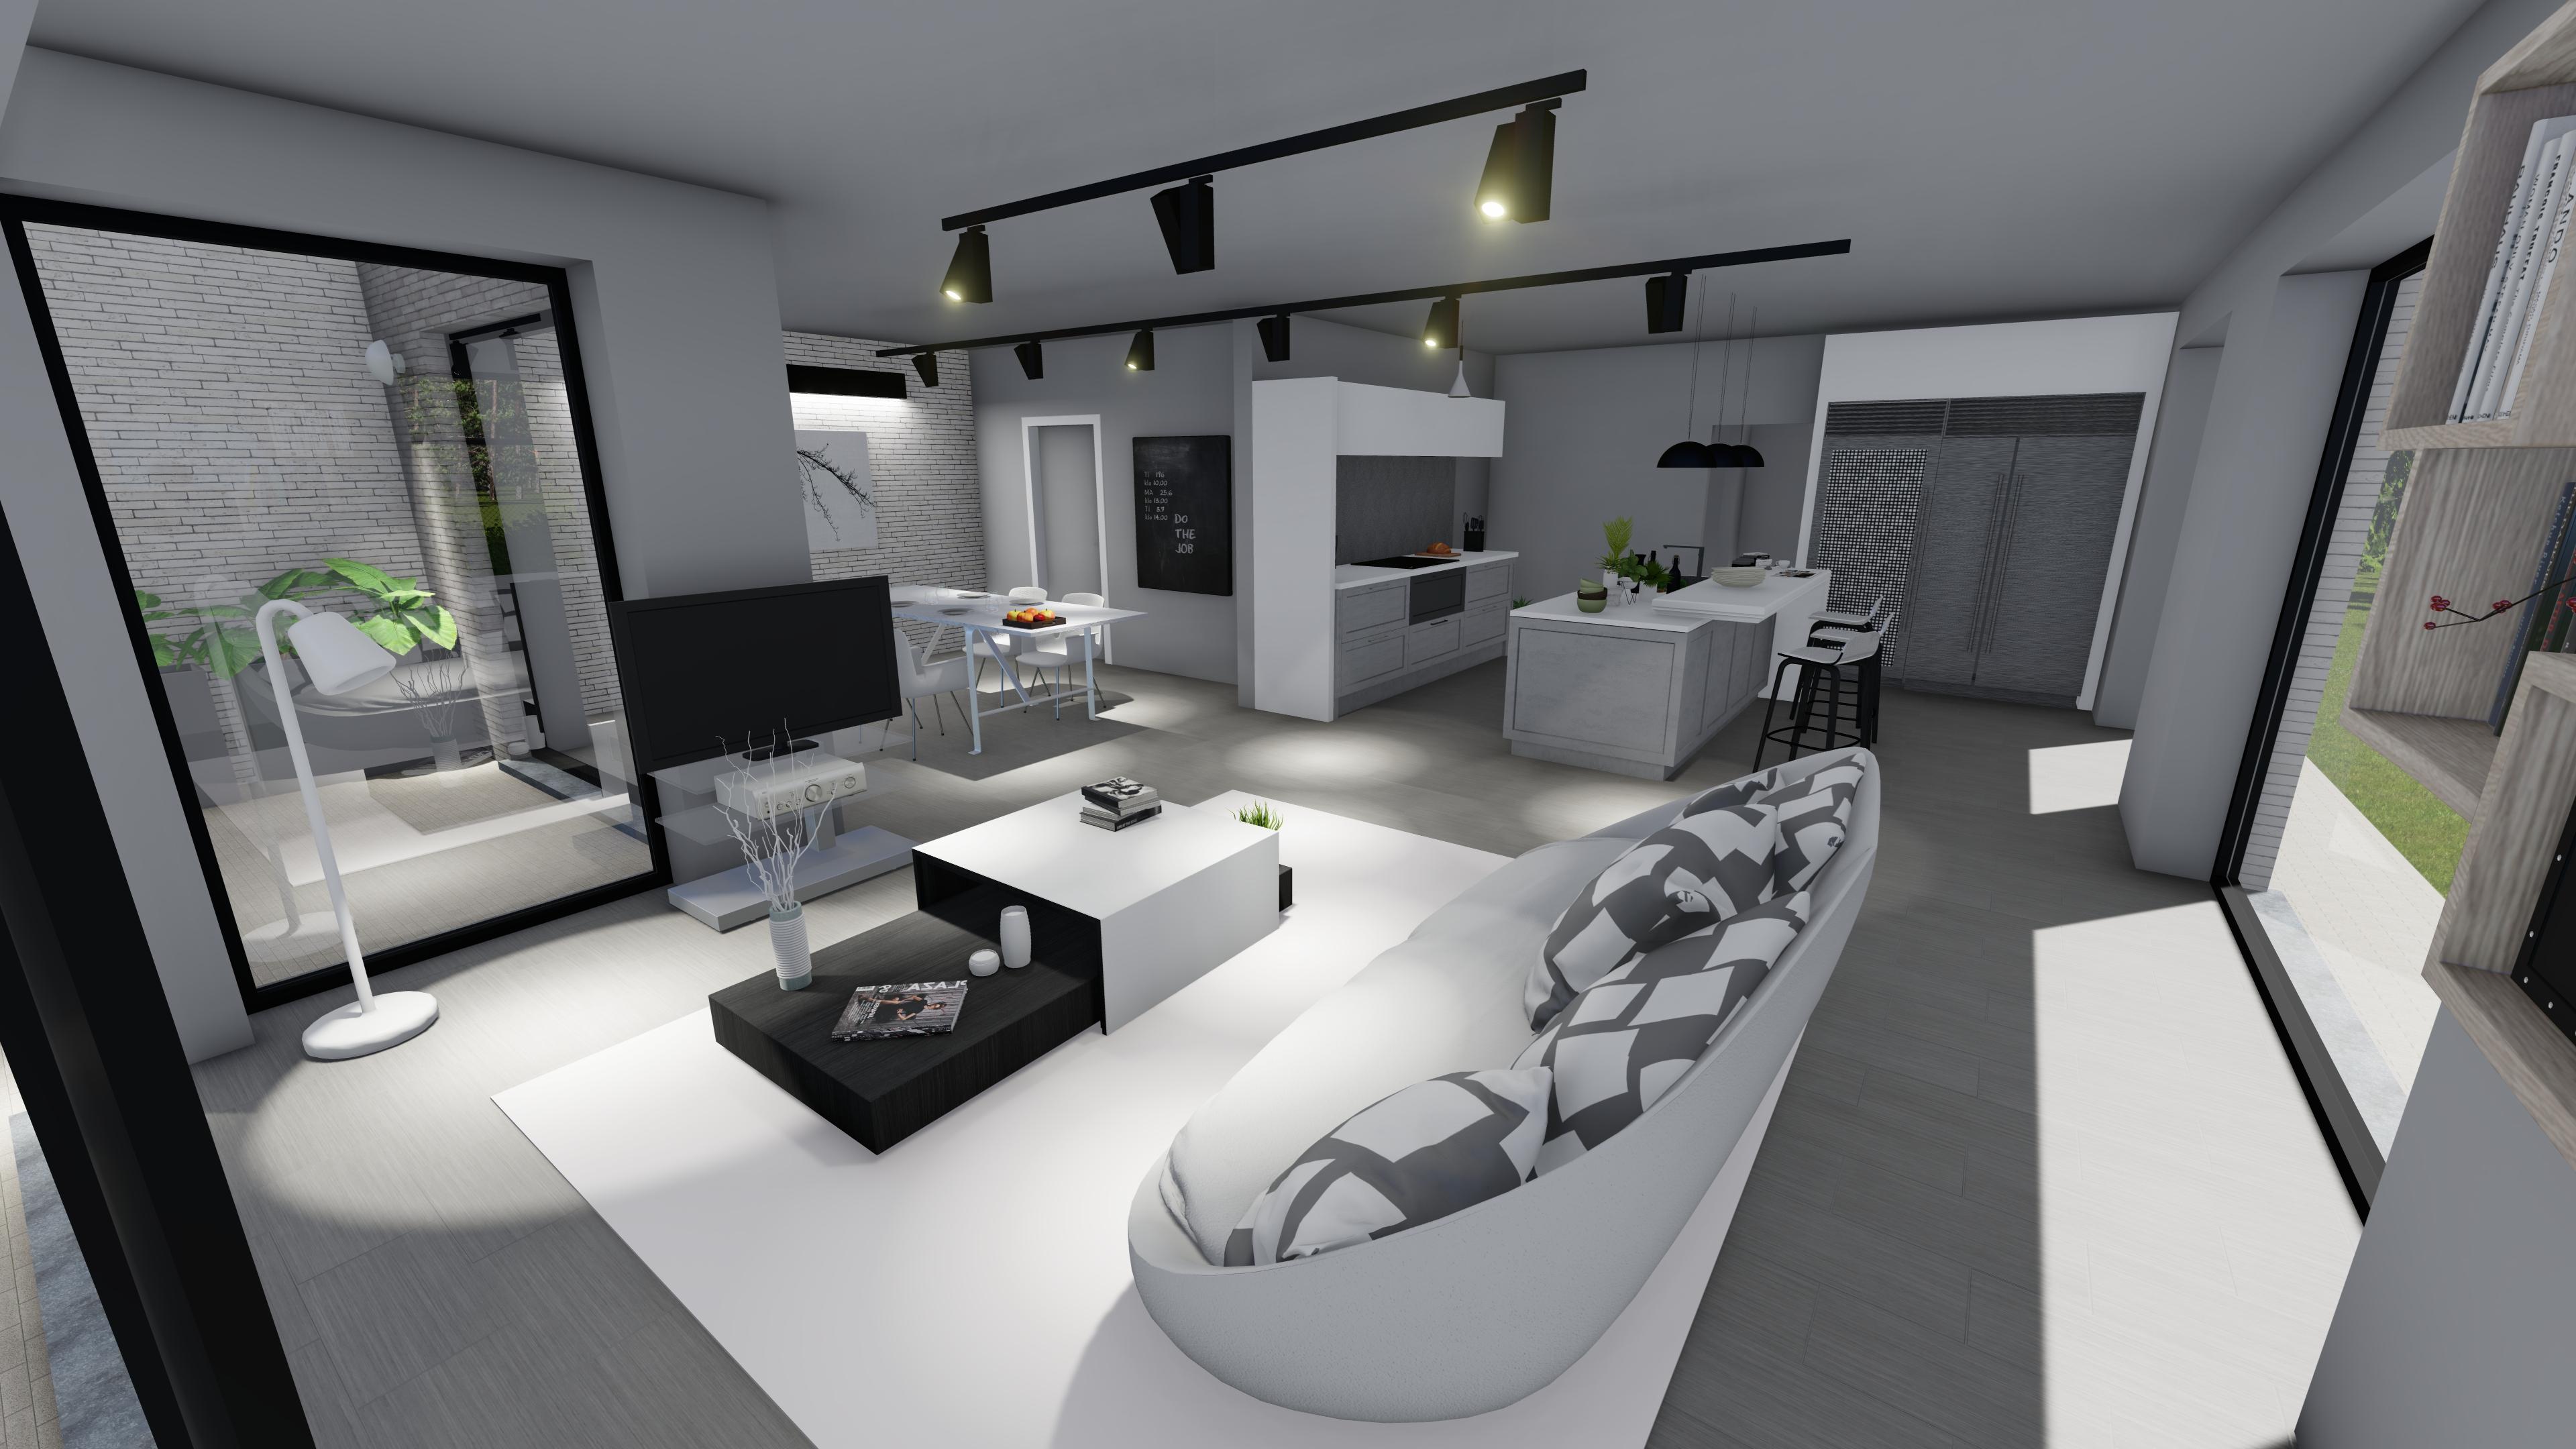 keuken_1 - Foto